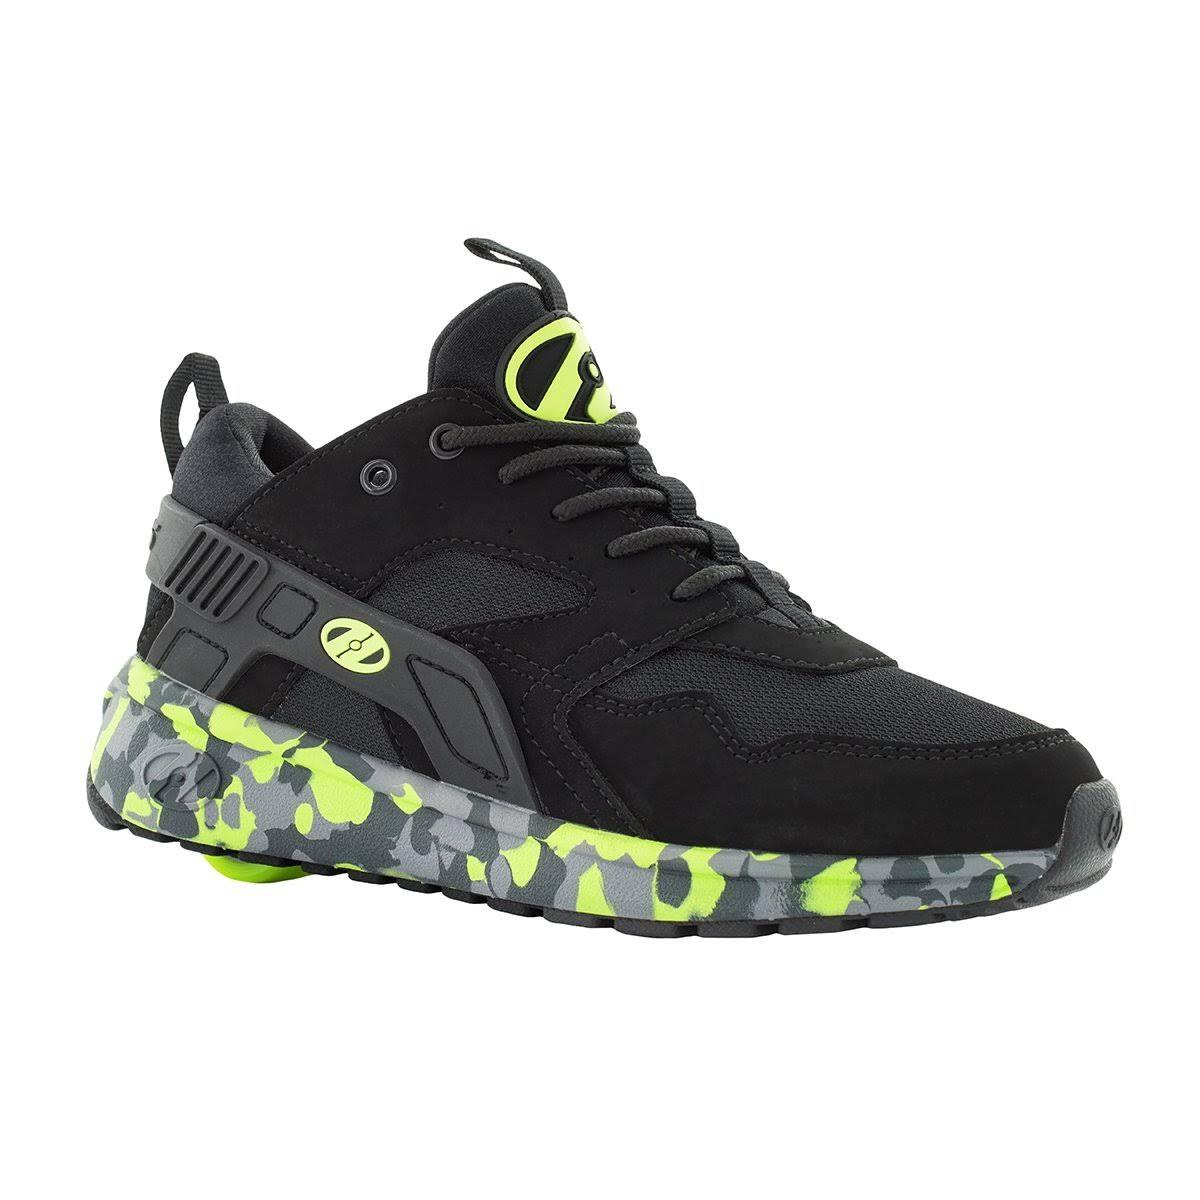 Confeti Unisex Brillante Negro Amarillo Heelys Rodillo Fuerza 13 Niños Tamaño Zapato Para Negro De SqqxCnOw4a